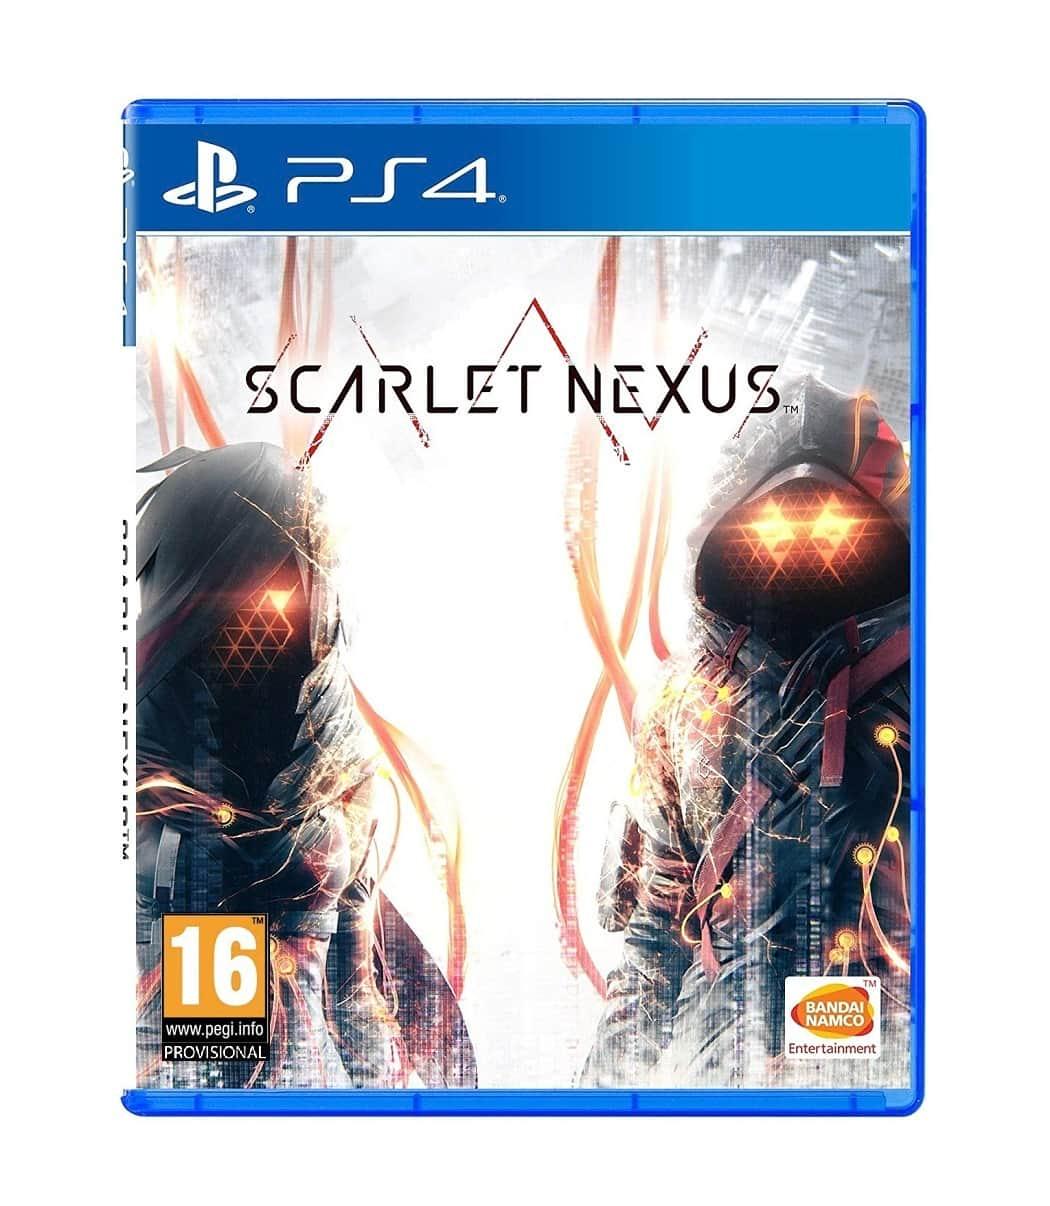 Sacrlet Nexus